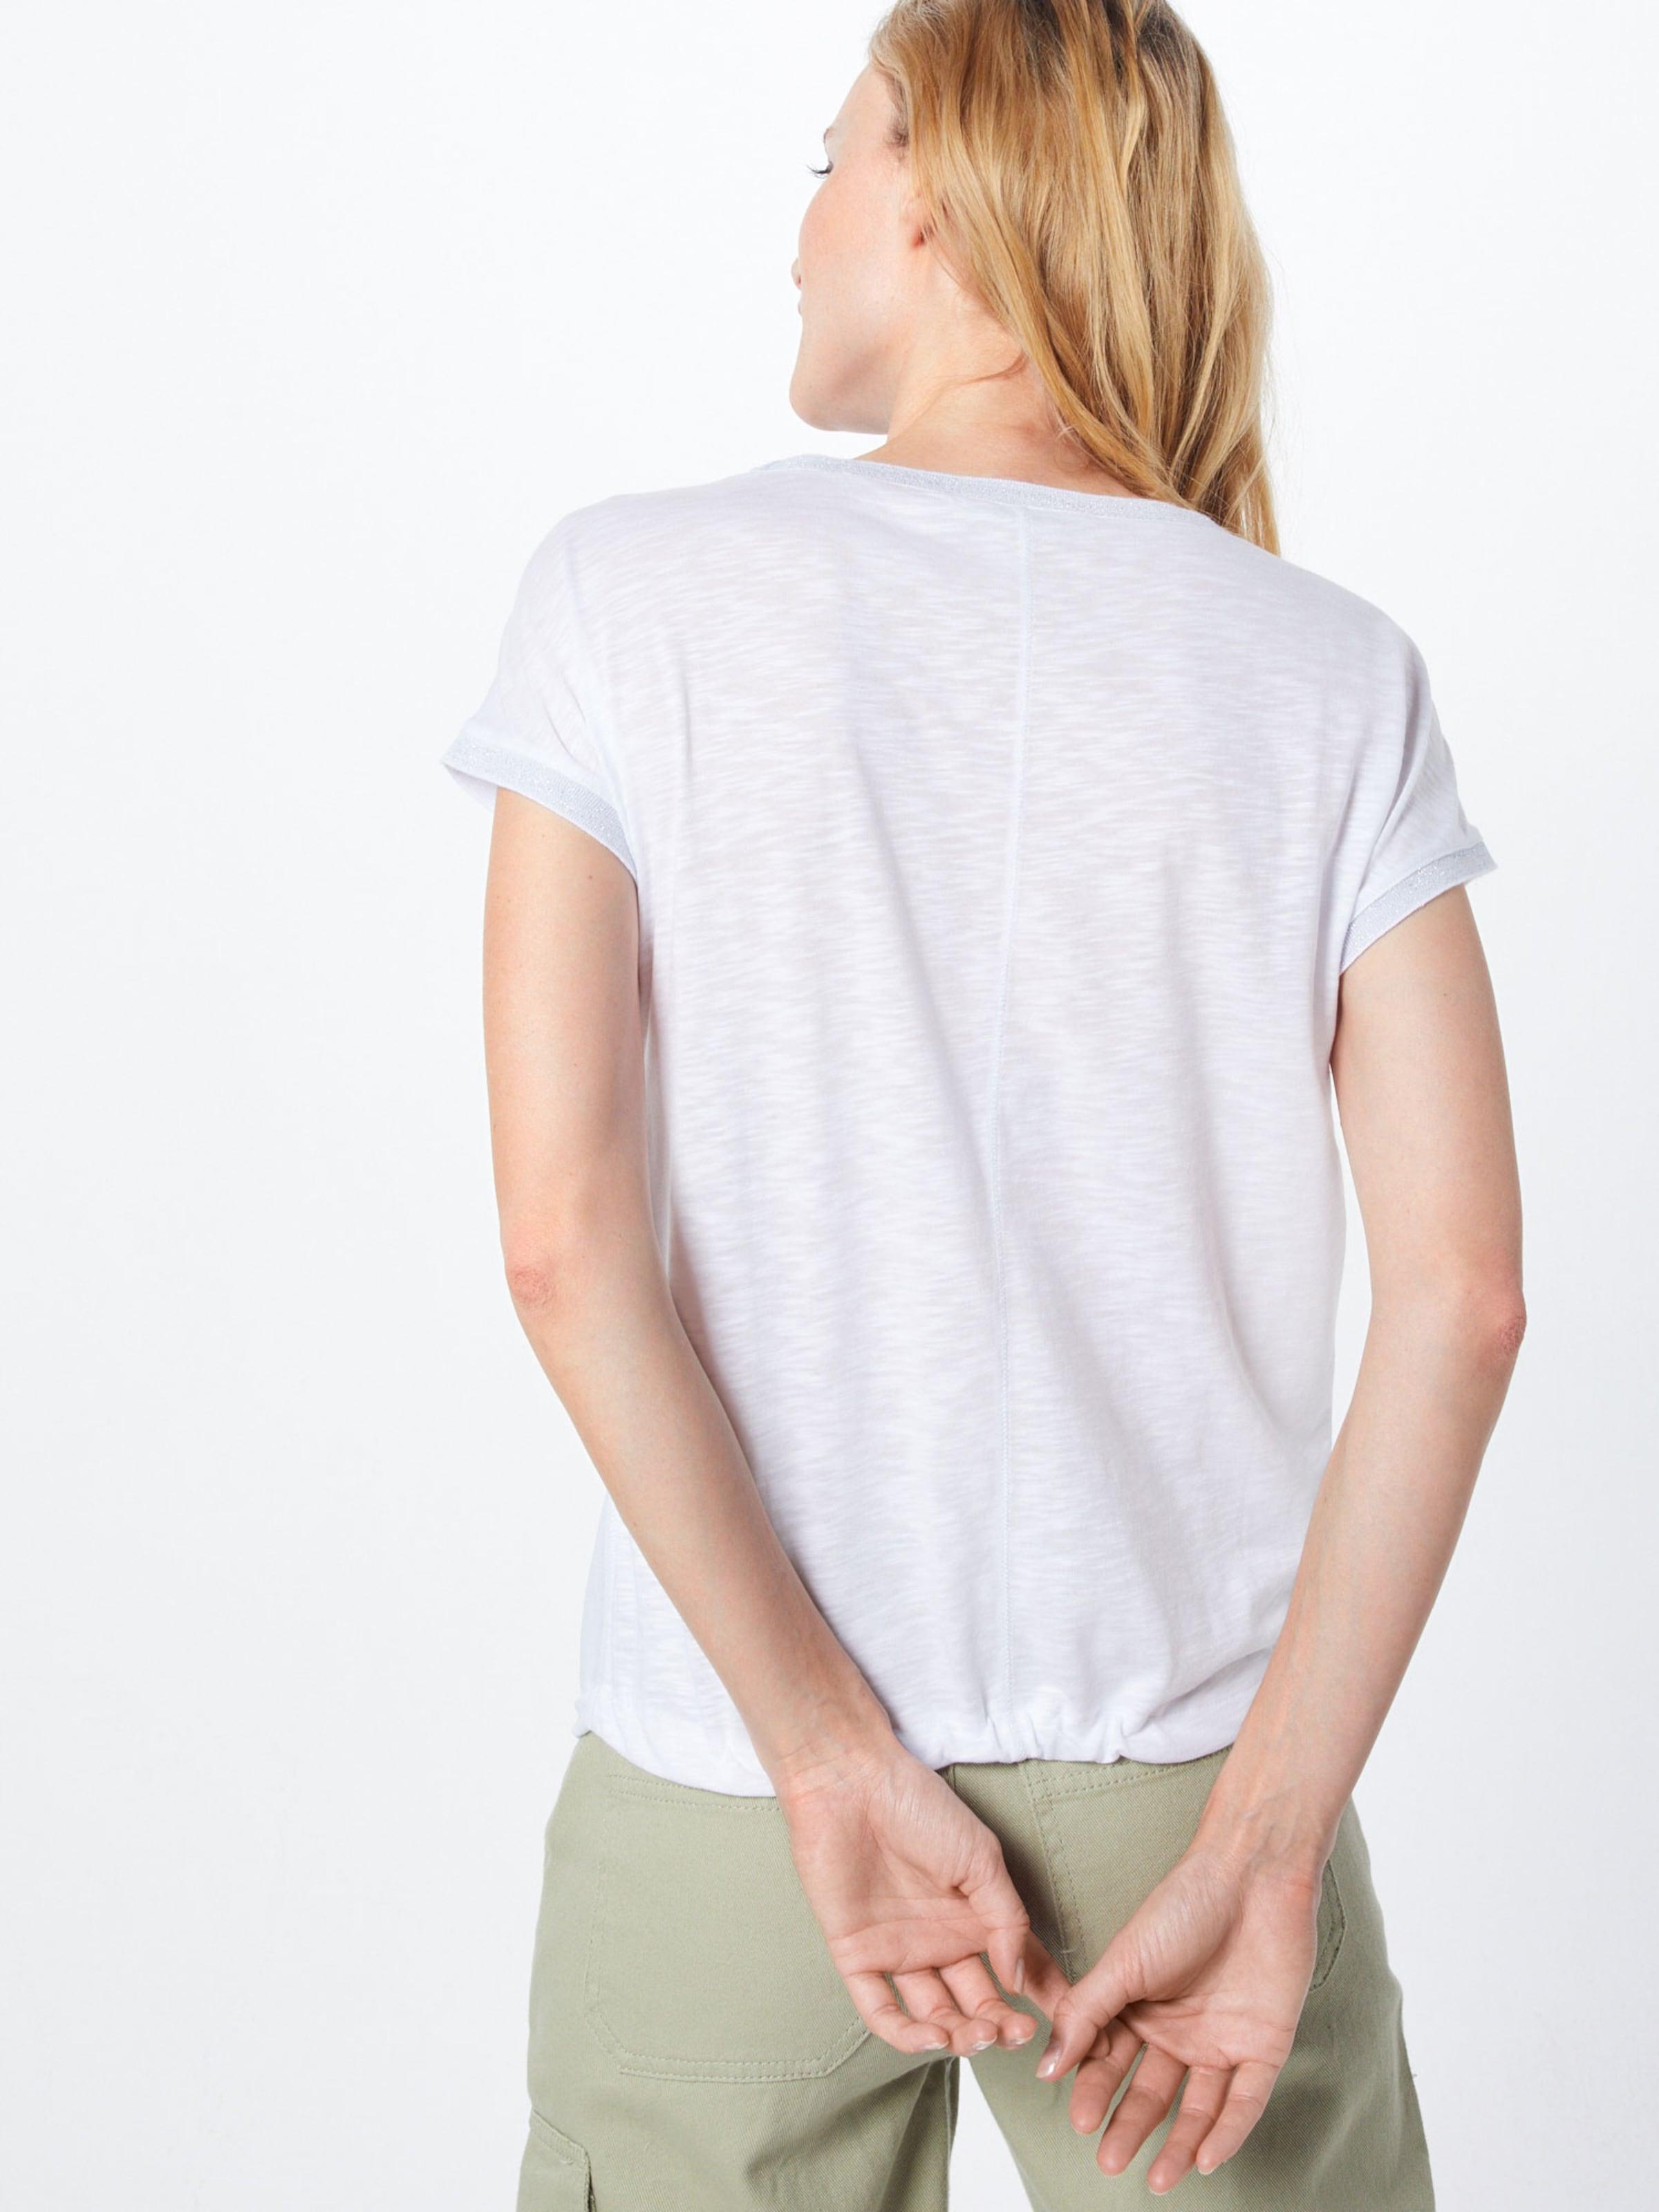 En BleuArgent Monari shirt T Blanc 7byvY6fg